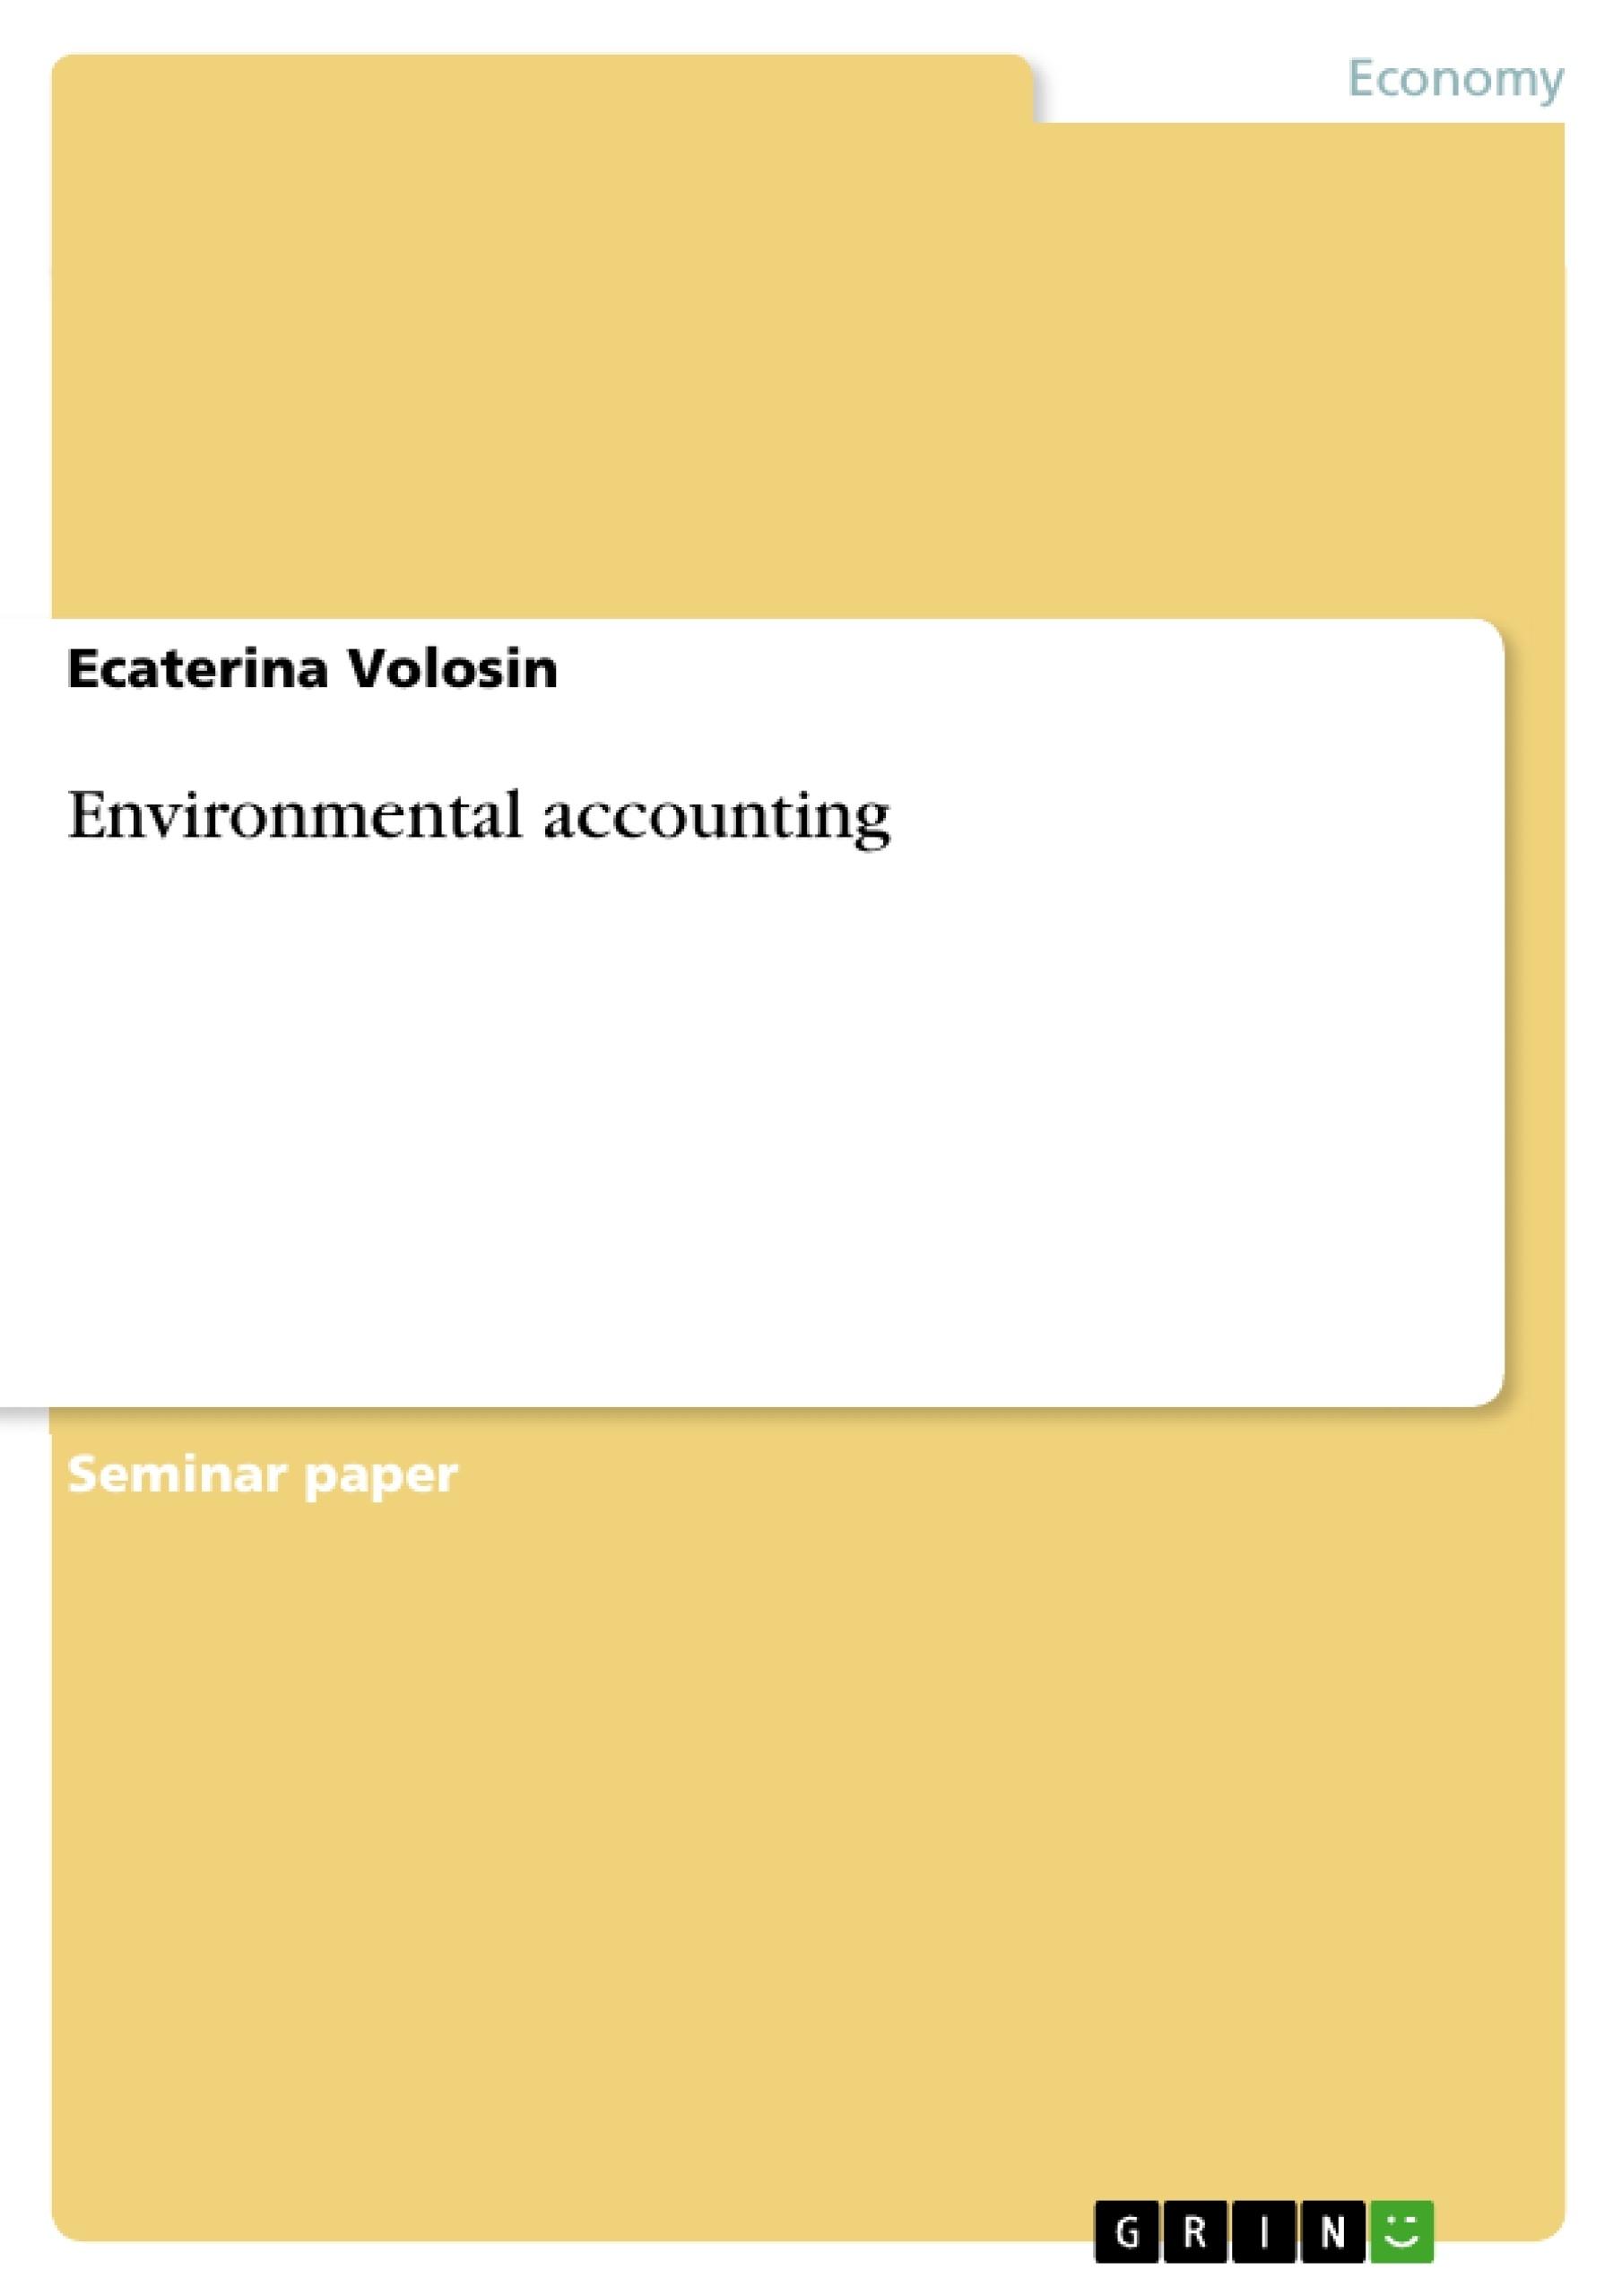 Title: Environmental accounting